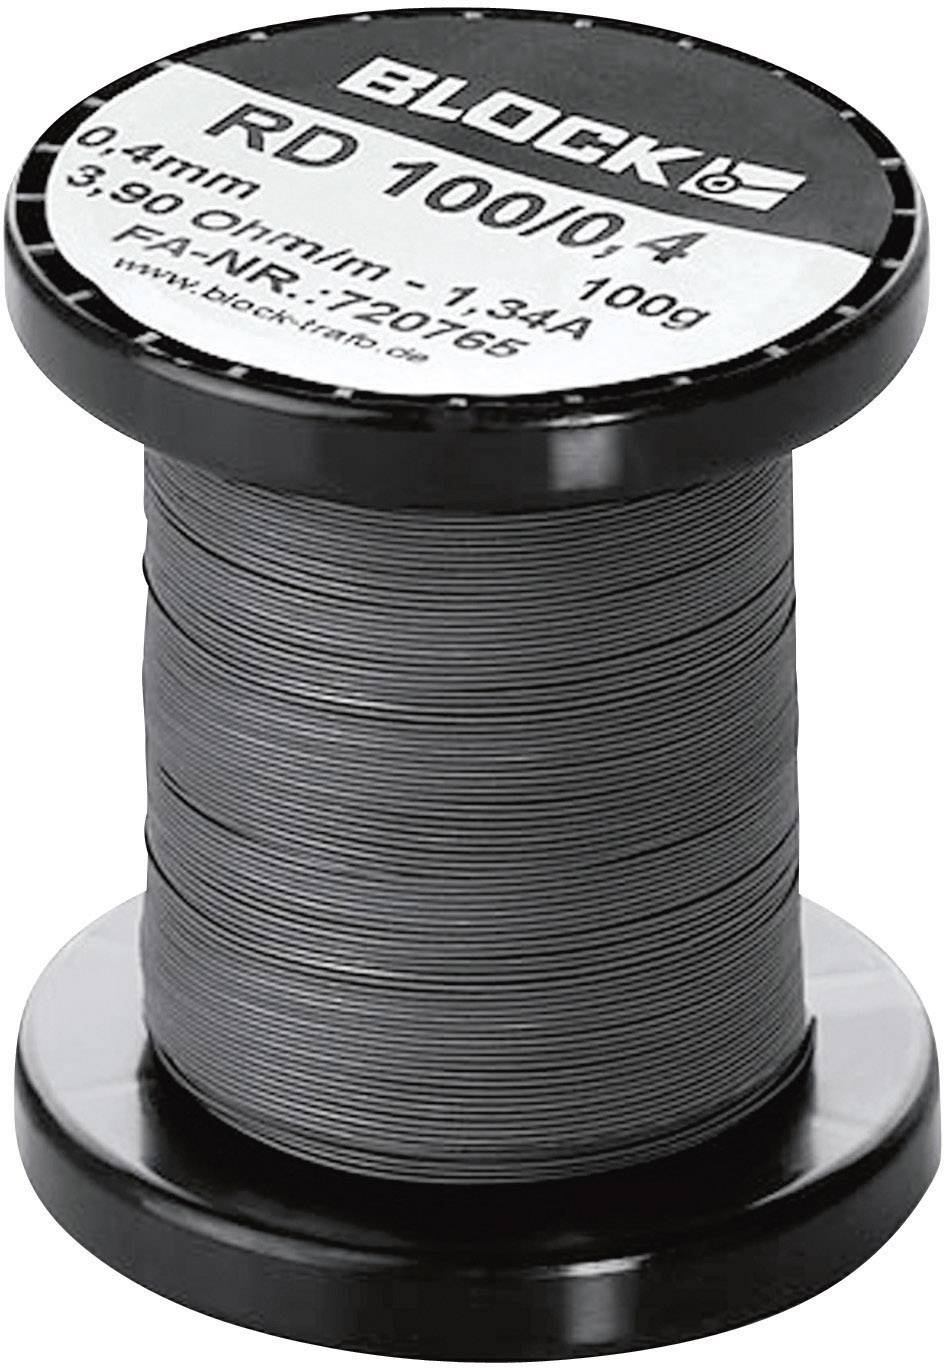 Odporový drát (konstantan) Block RD 100/0,8, 0.975 Ω/m, 22 m